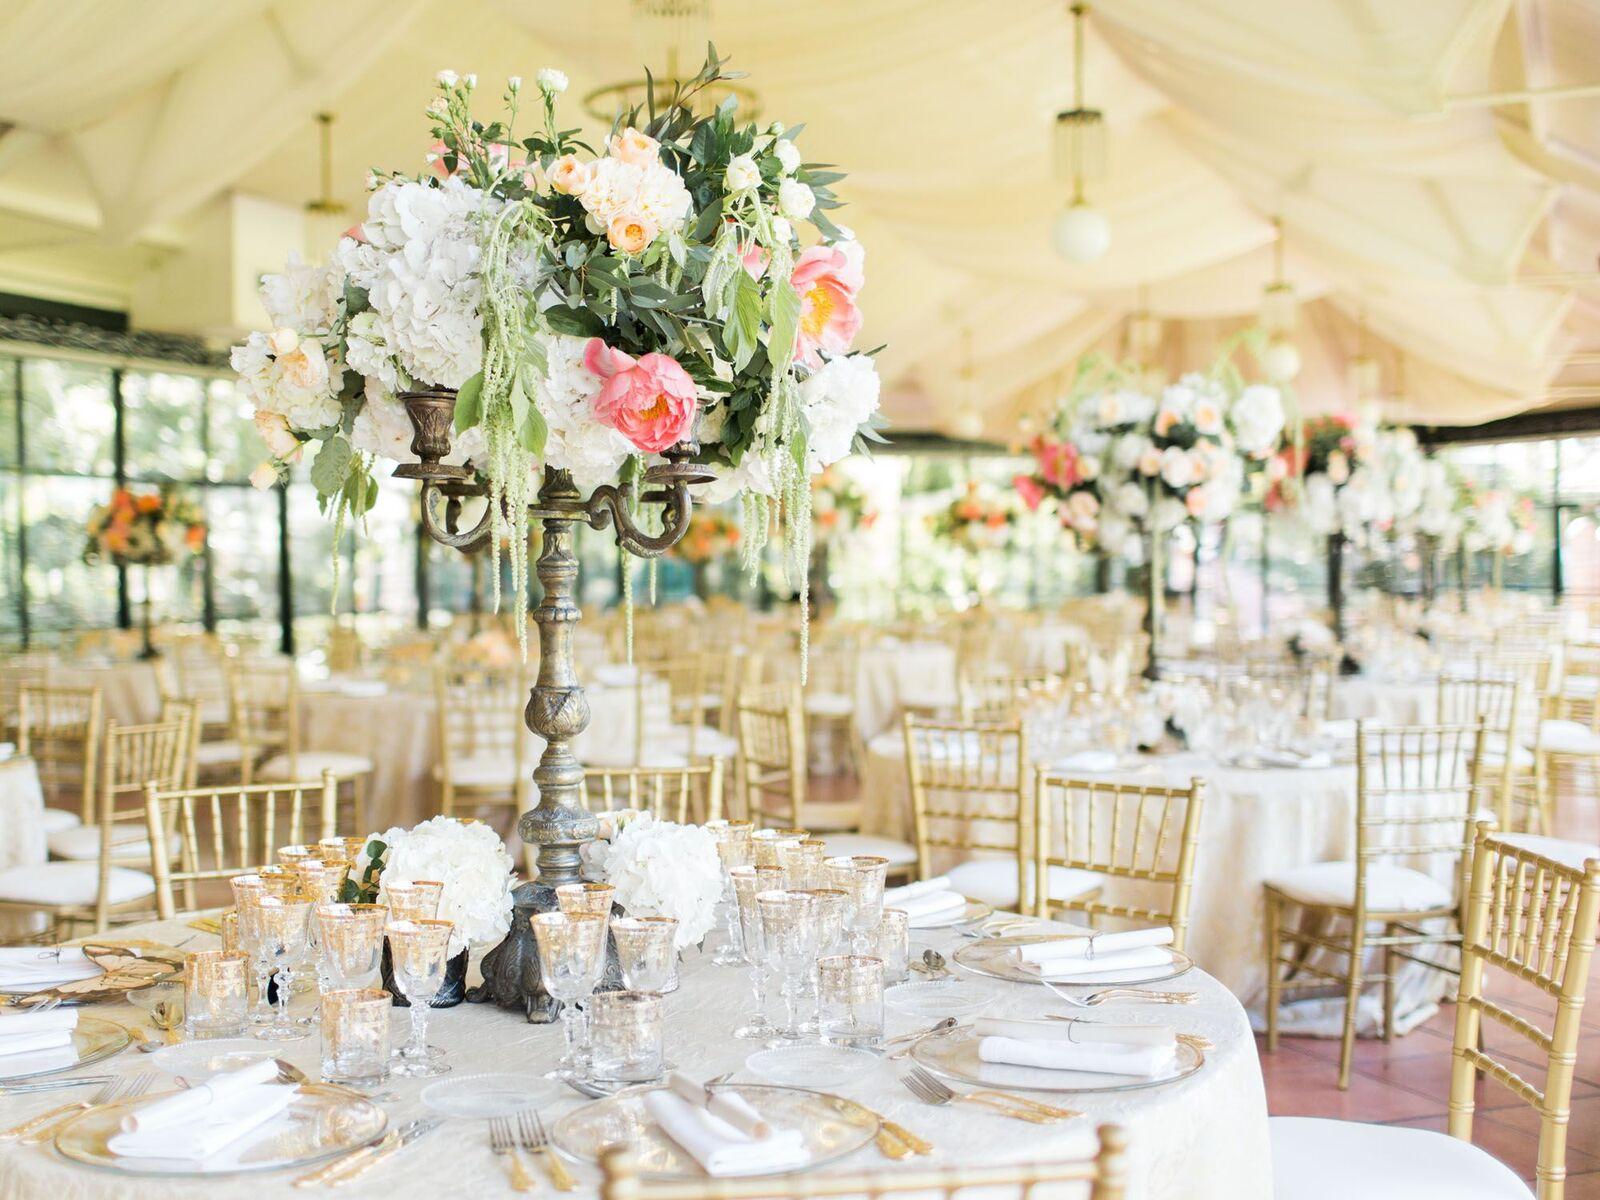 Si-Quiero-Wedding-Planner-Sira-Antequera-Paola-Pedro-018